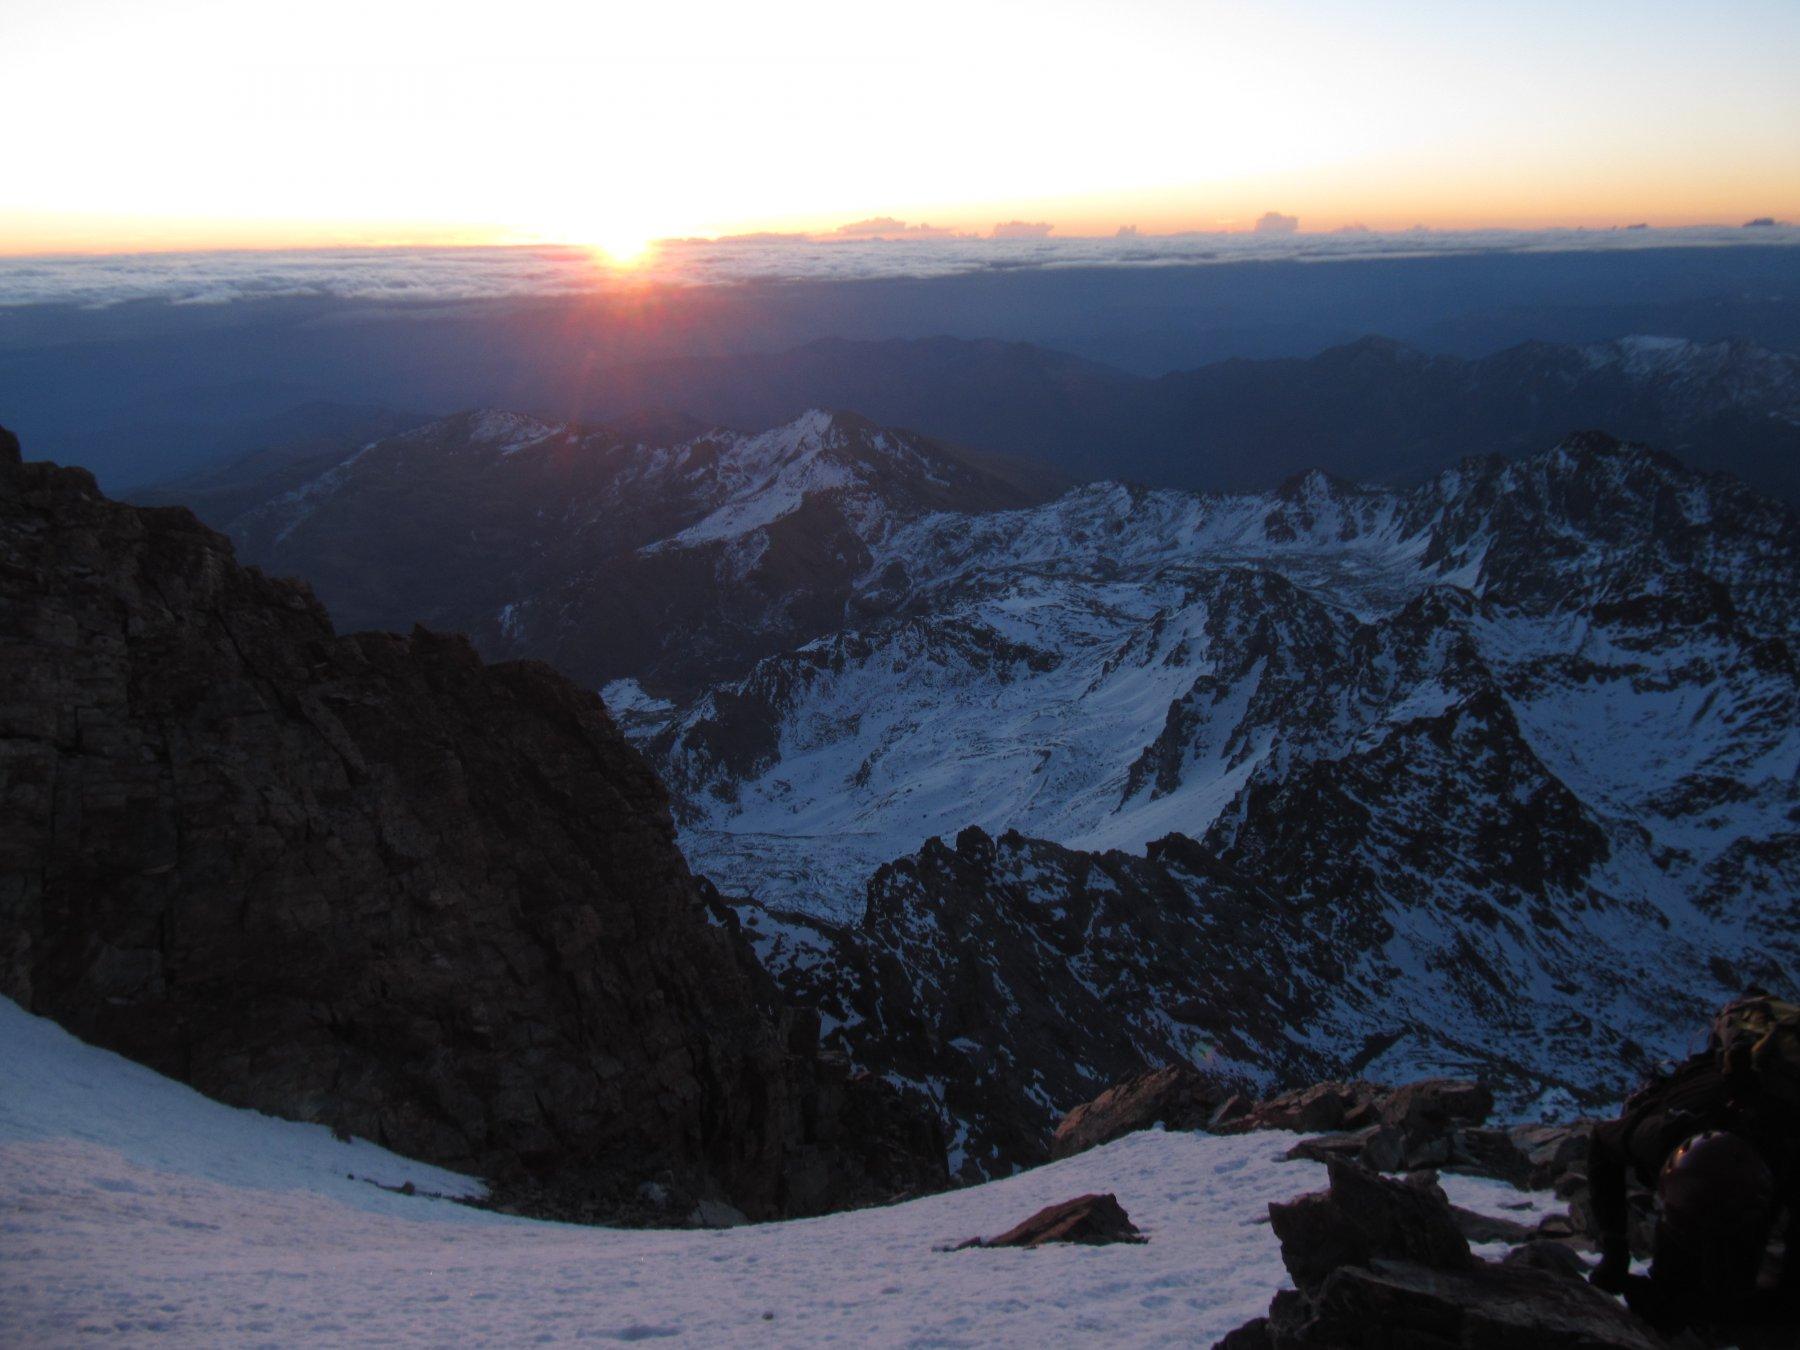 L'alba durante la salita